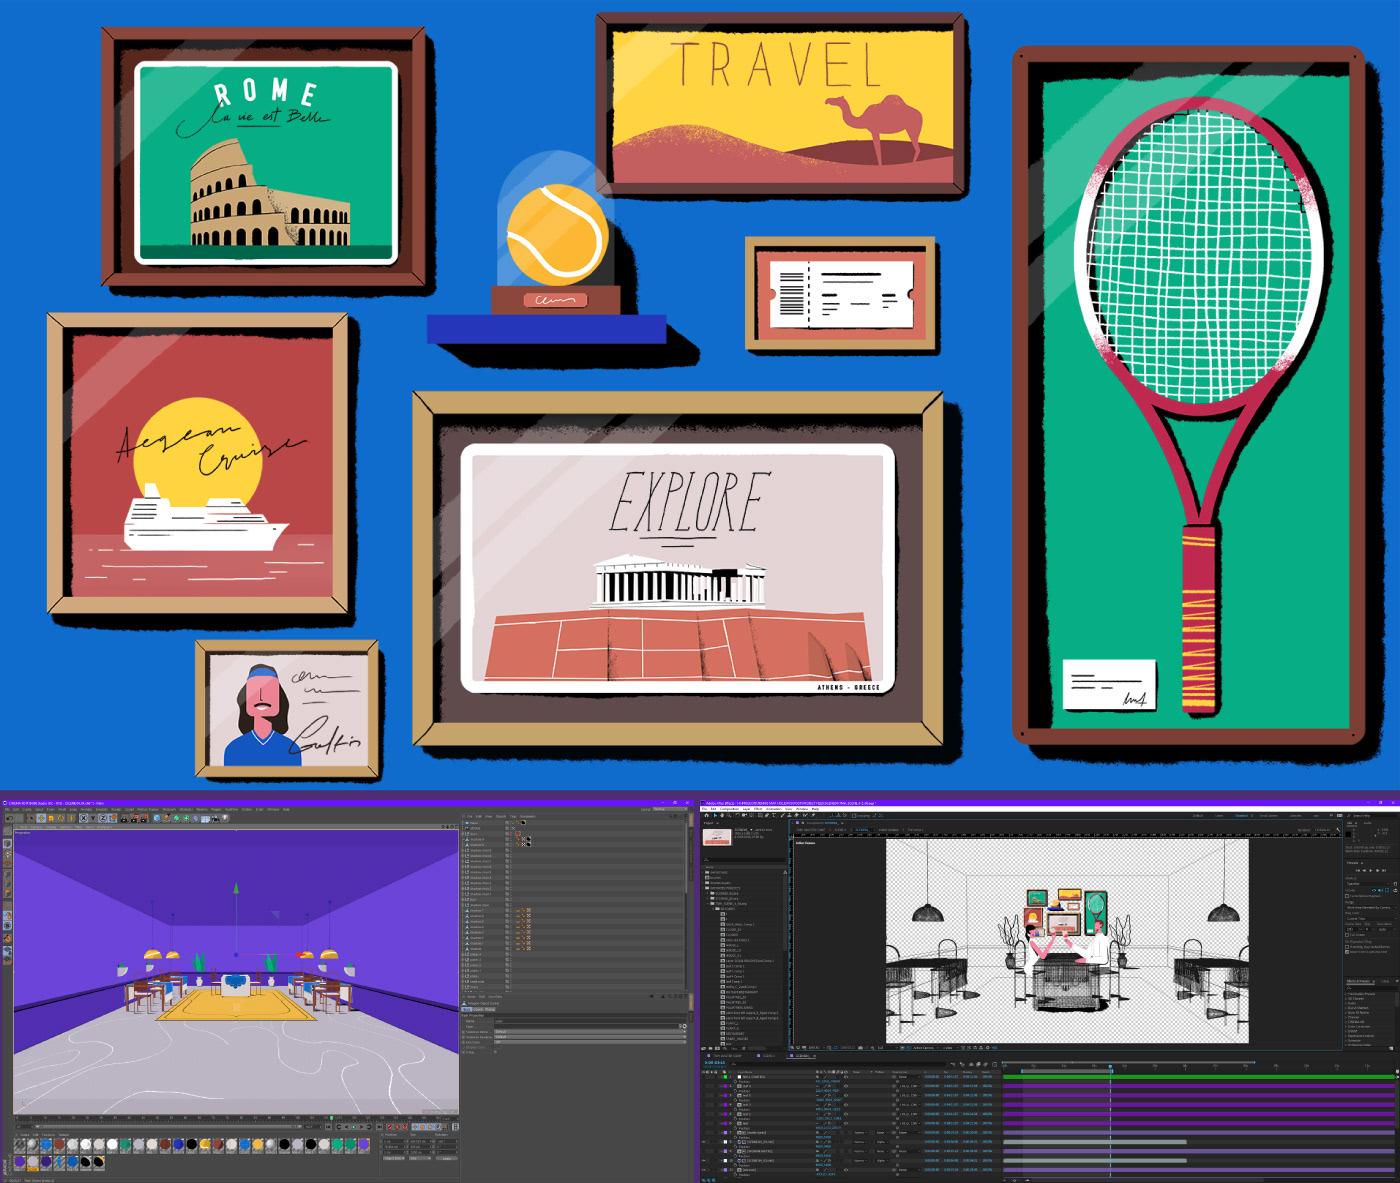 Image may contain: screenshot, cartoon and athletic game